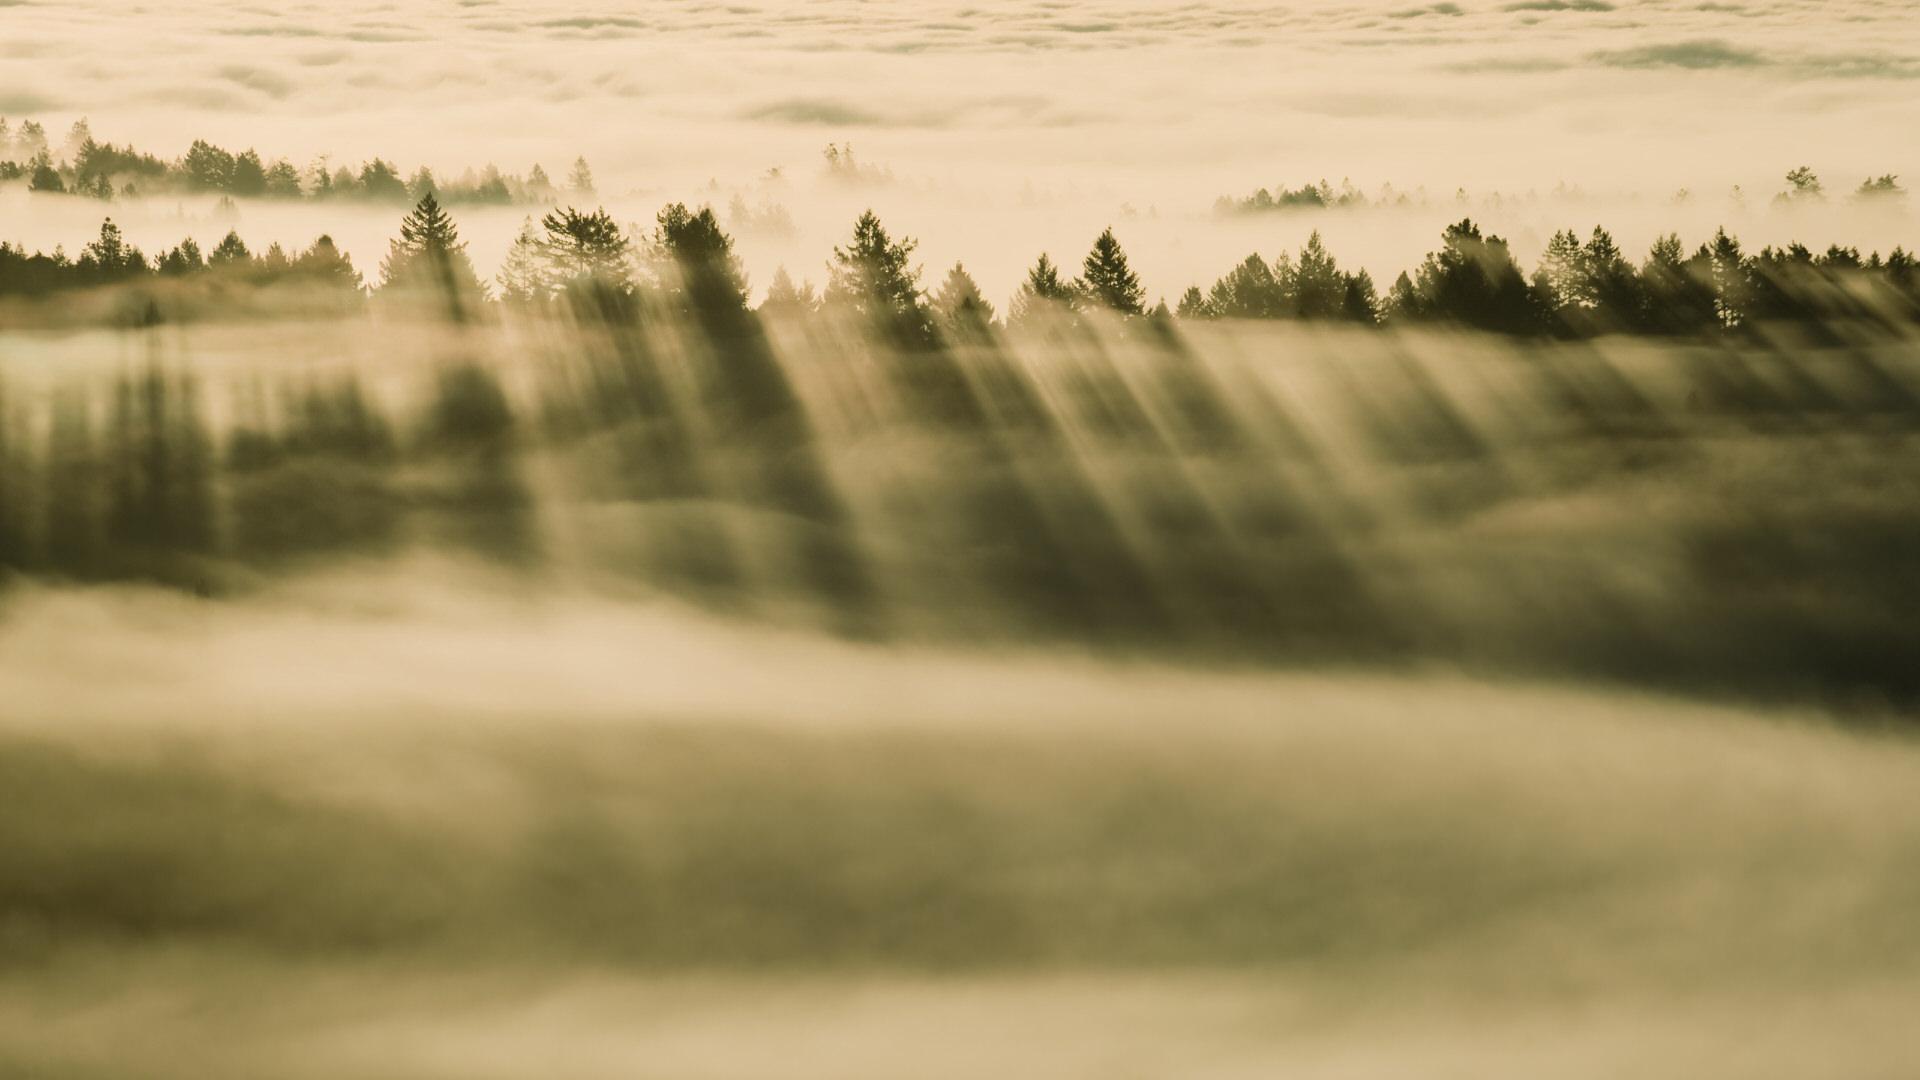 macOS Mavericks系统自带壁纸foggy-forest高清壁纸